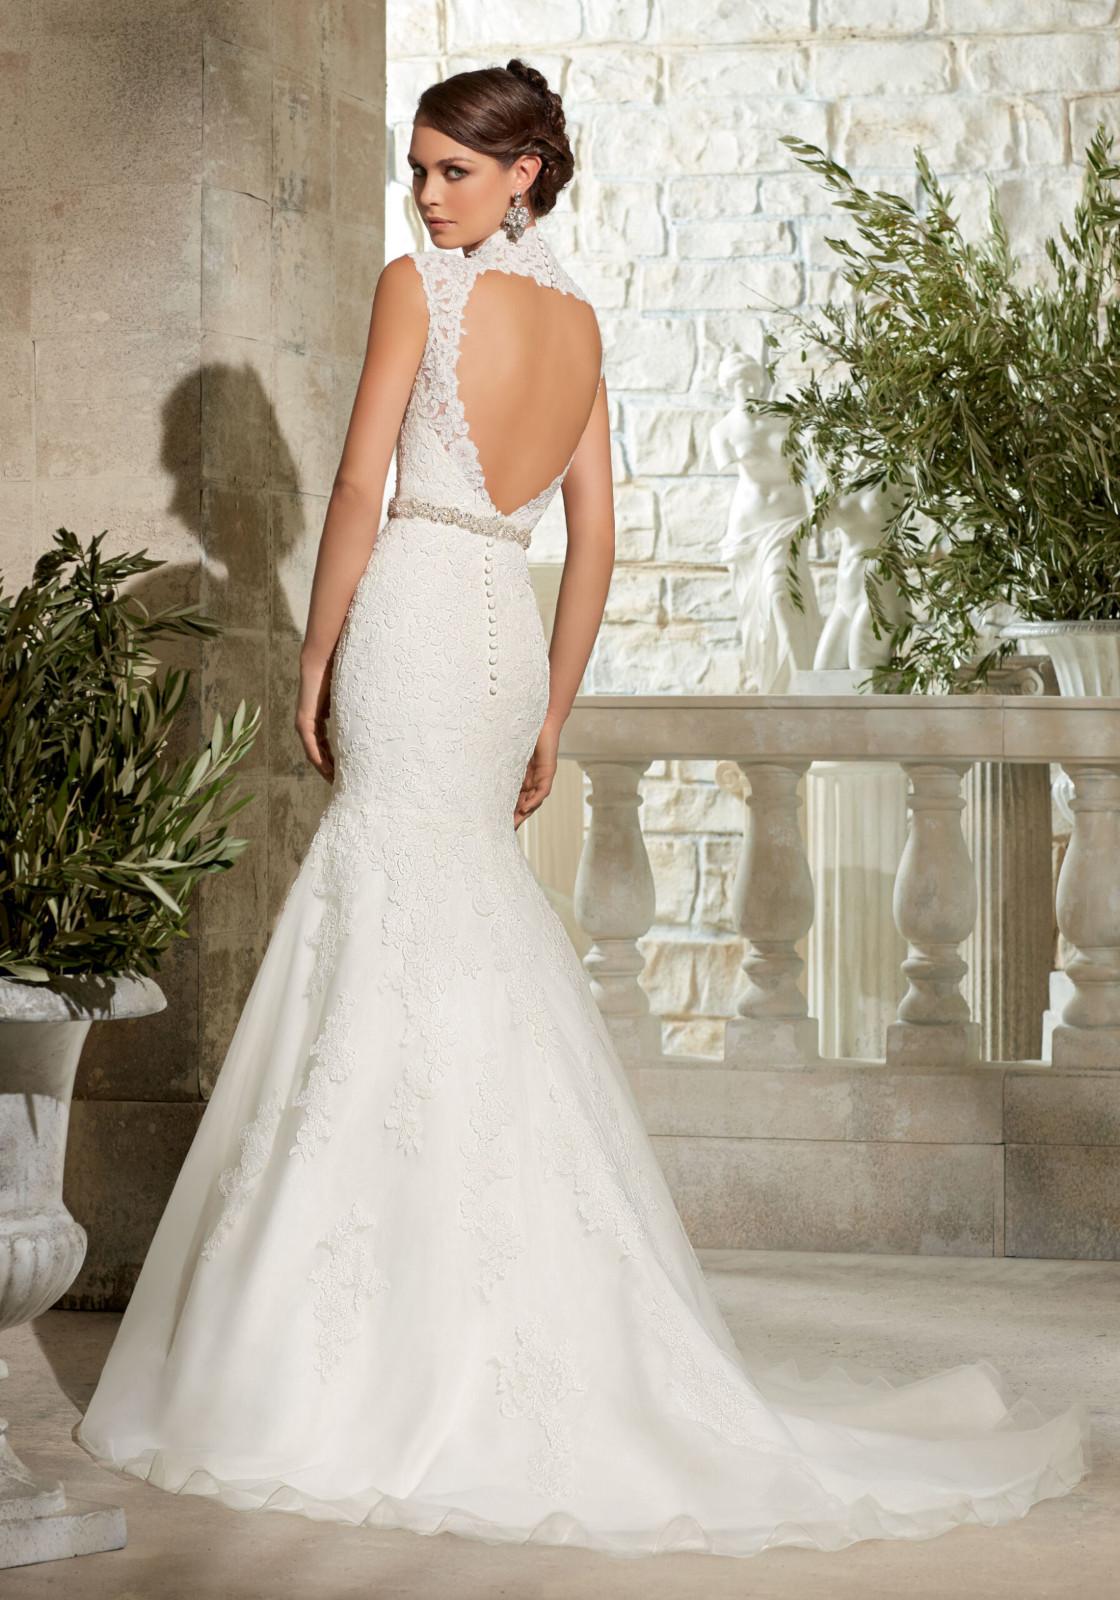 Elegant Νυφικό Φόρεμα, Morilee, Δαντέλα, Traditional. Style, 5303